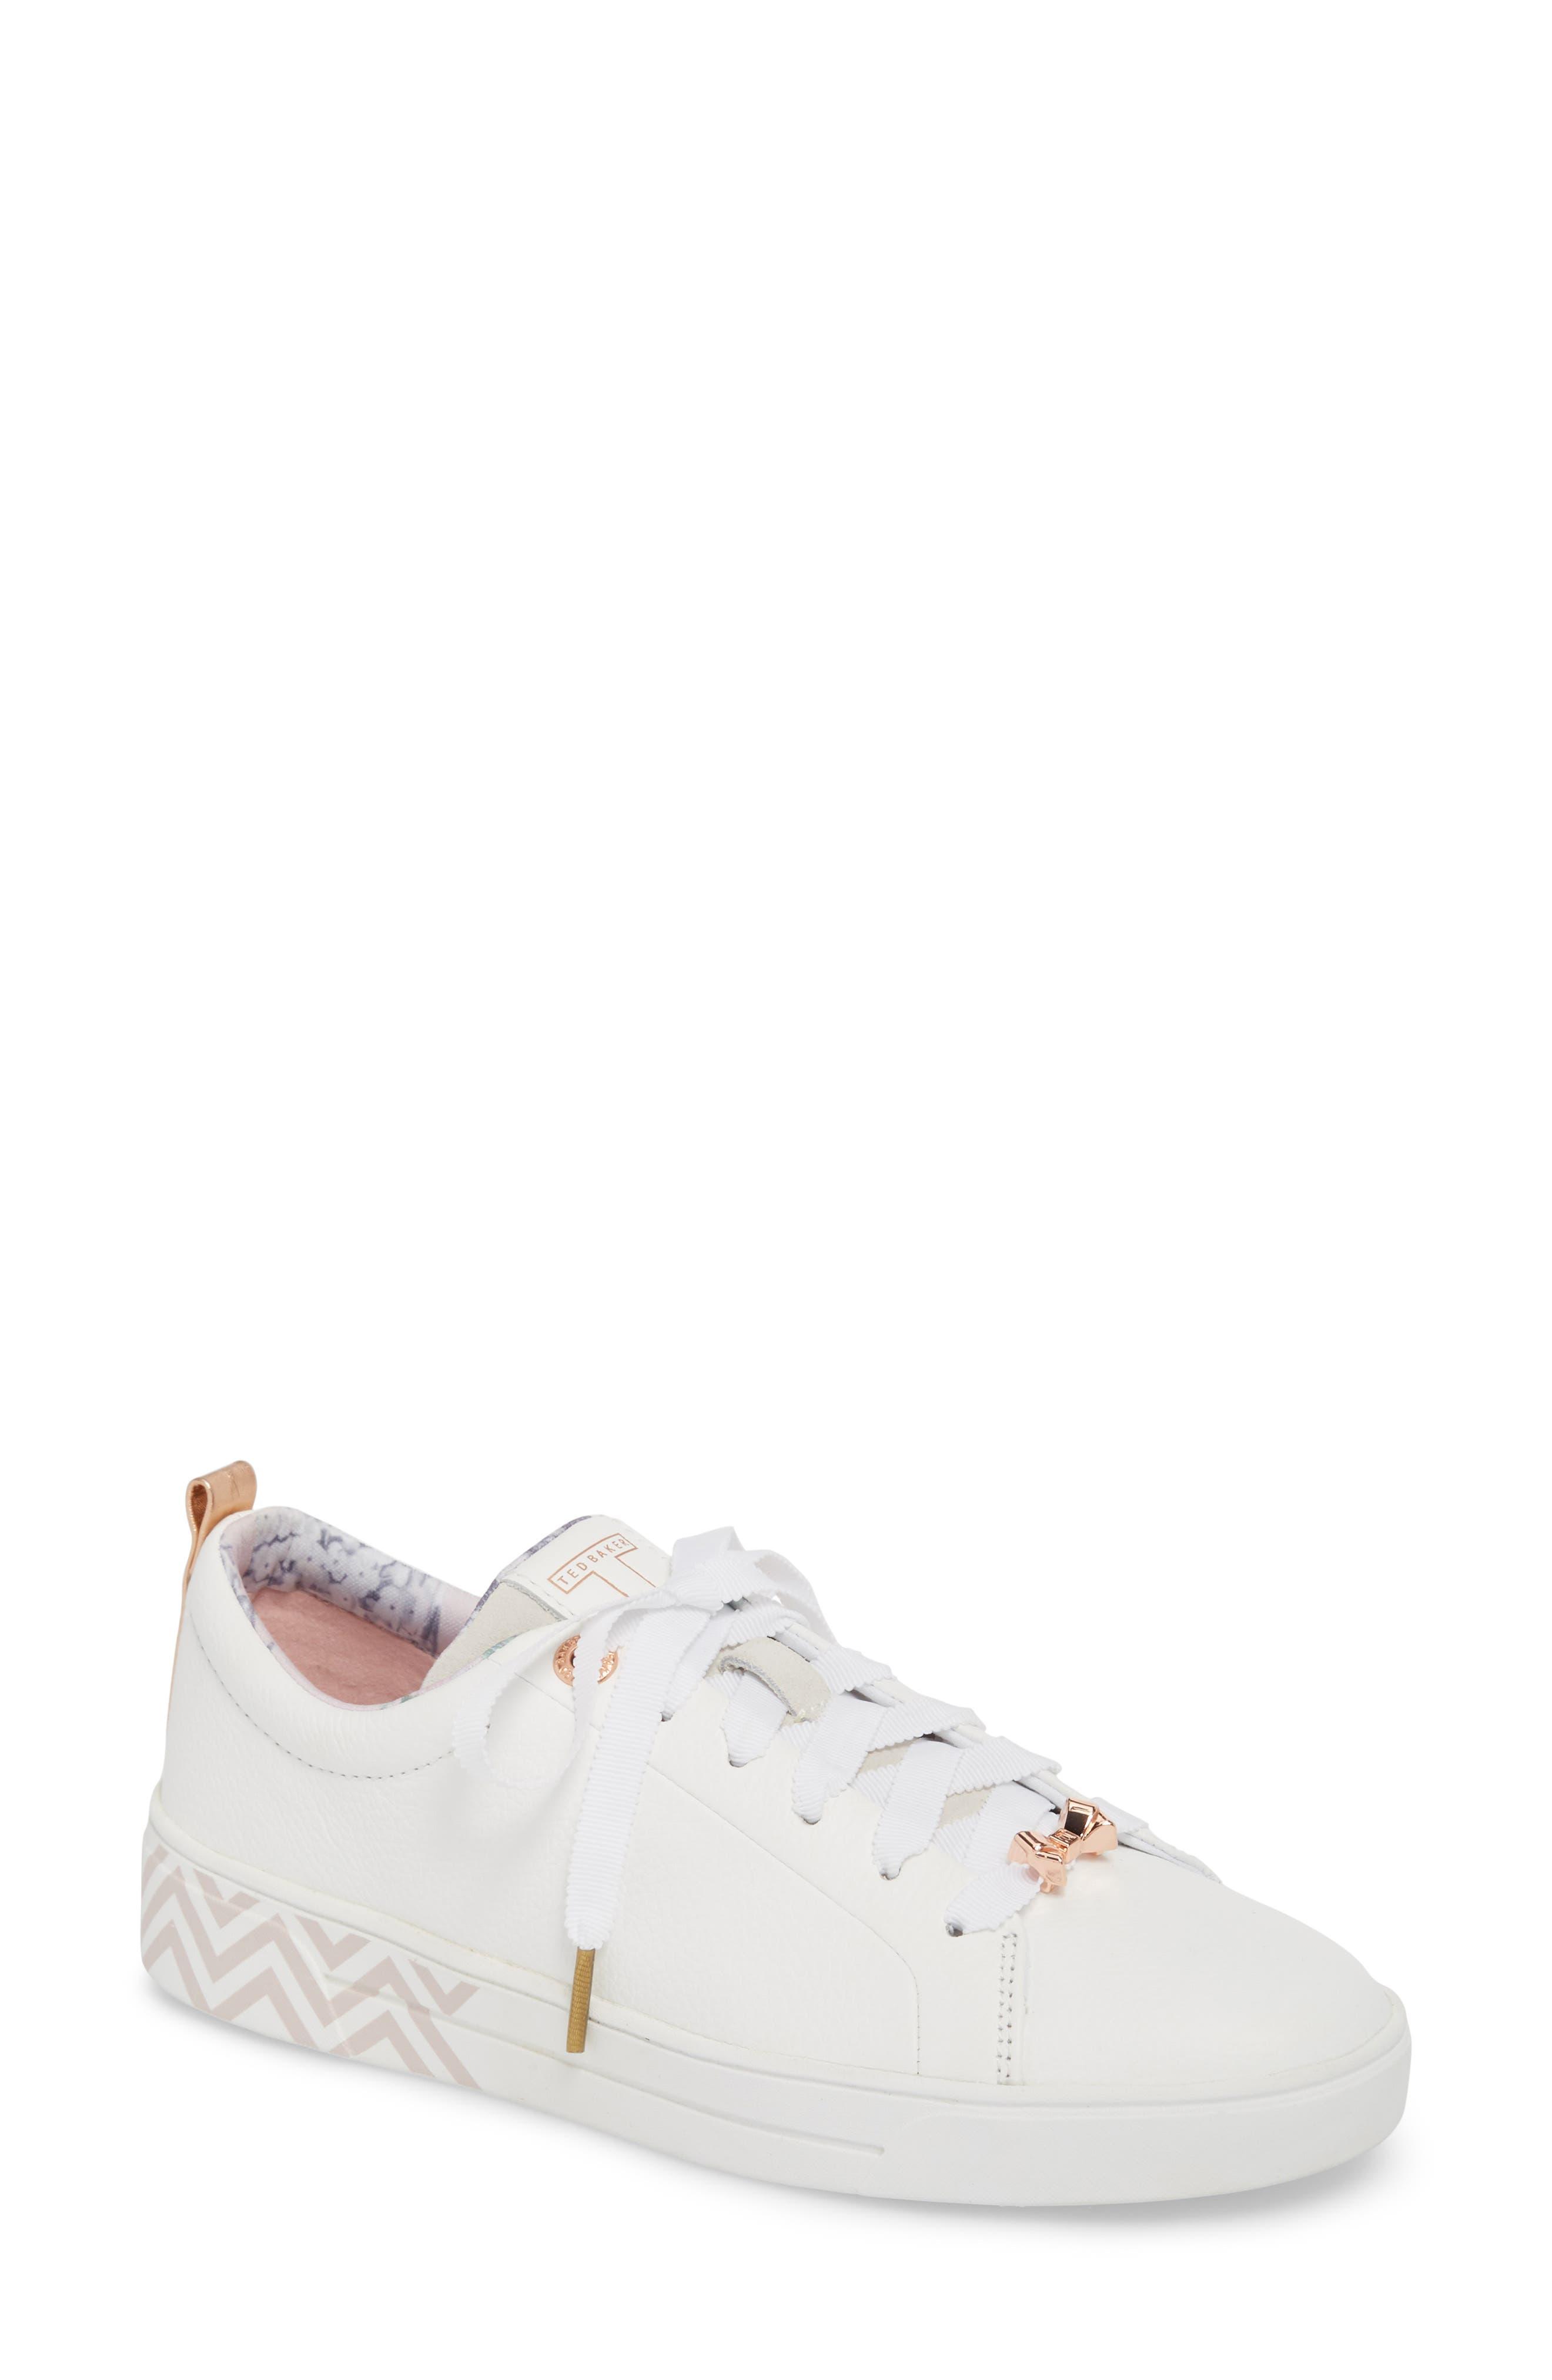 Kelleip Sneaker,                             Main thumbnail 1, color,                             PALACE GARDENS PRINT LEATHER